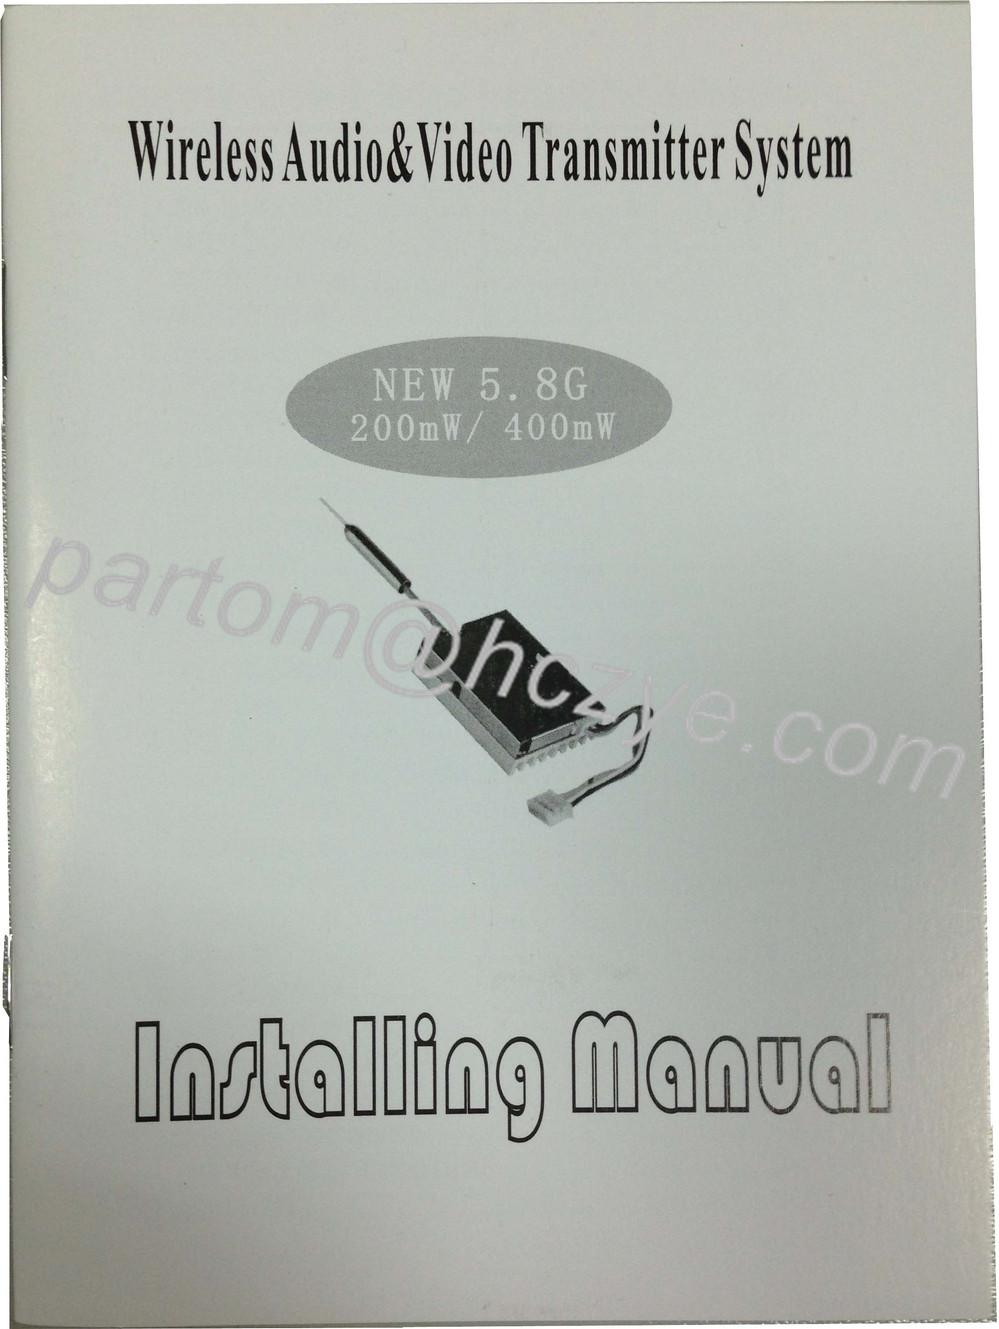 5.8GHz 400mW wireless video transmitter receiver